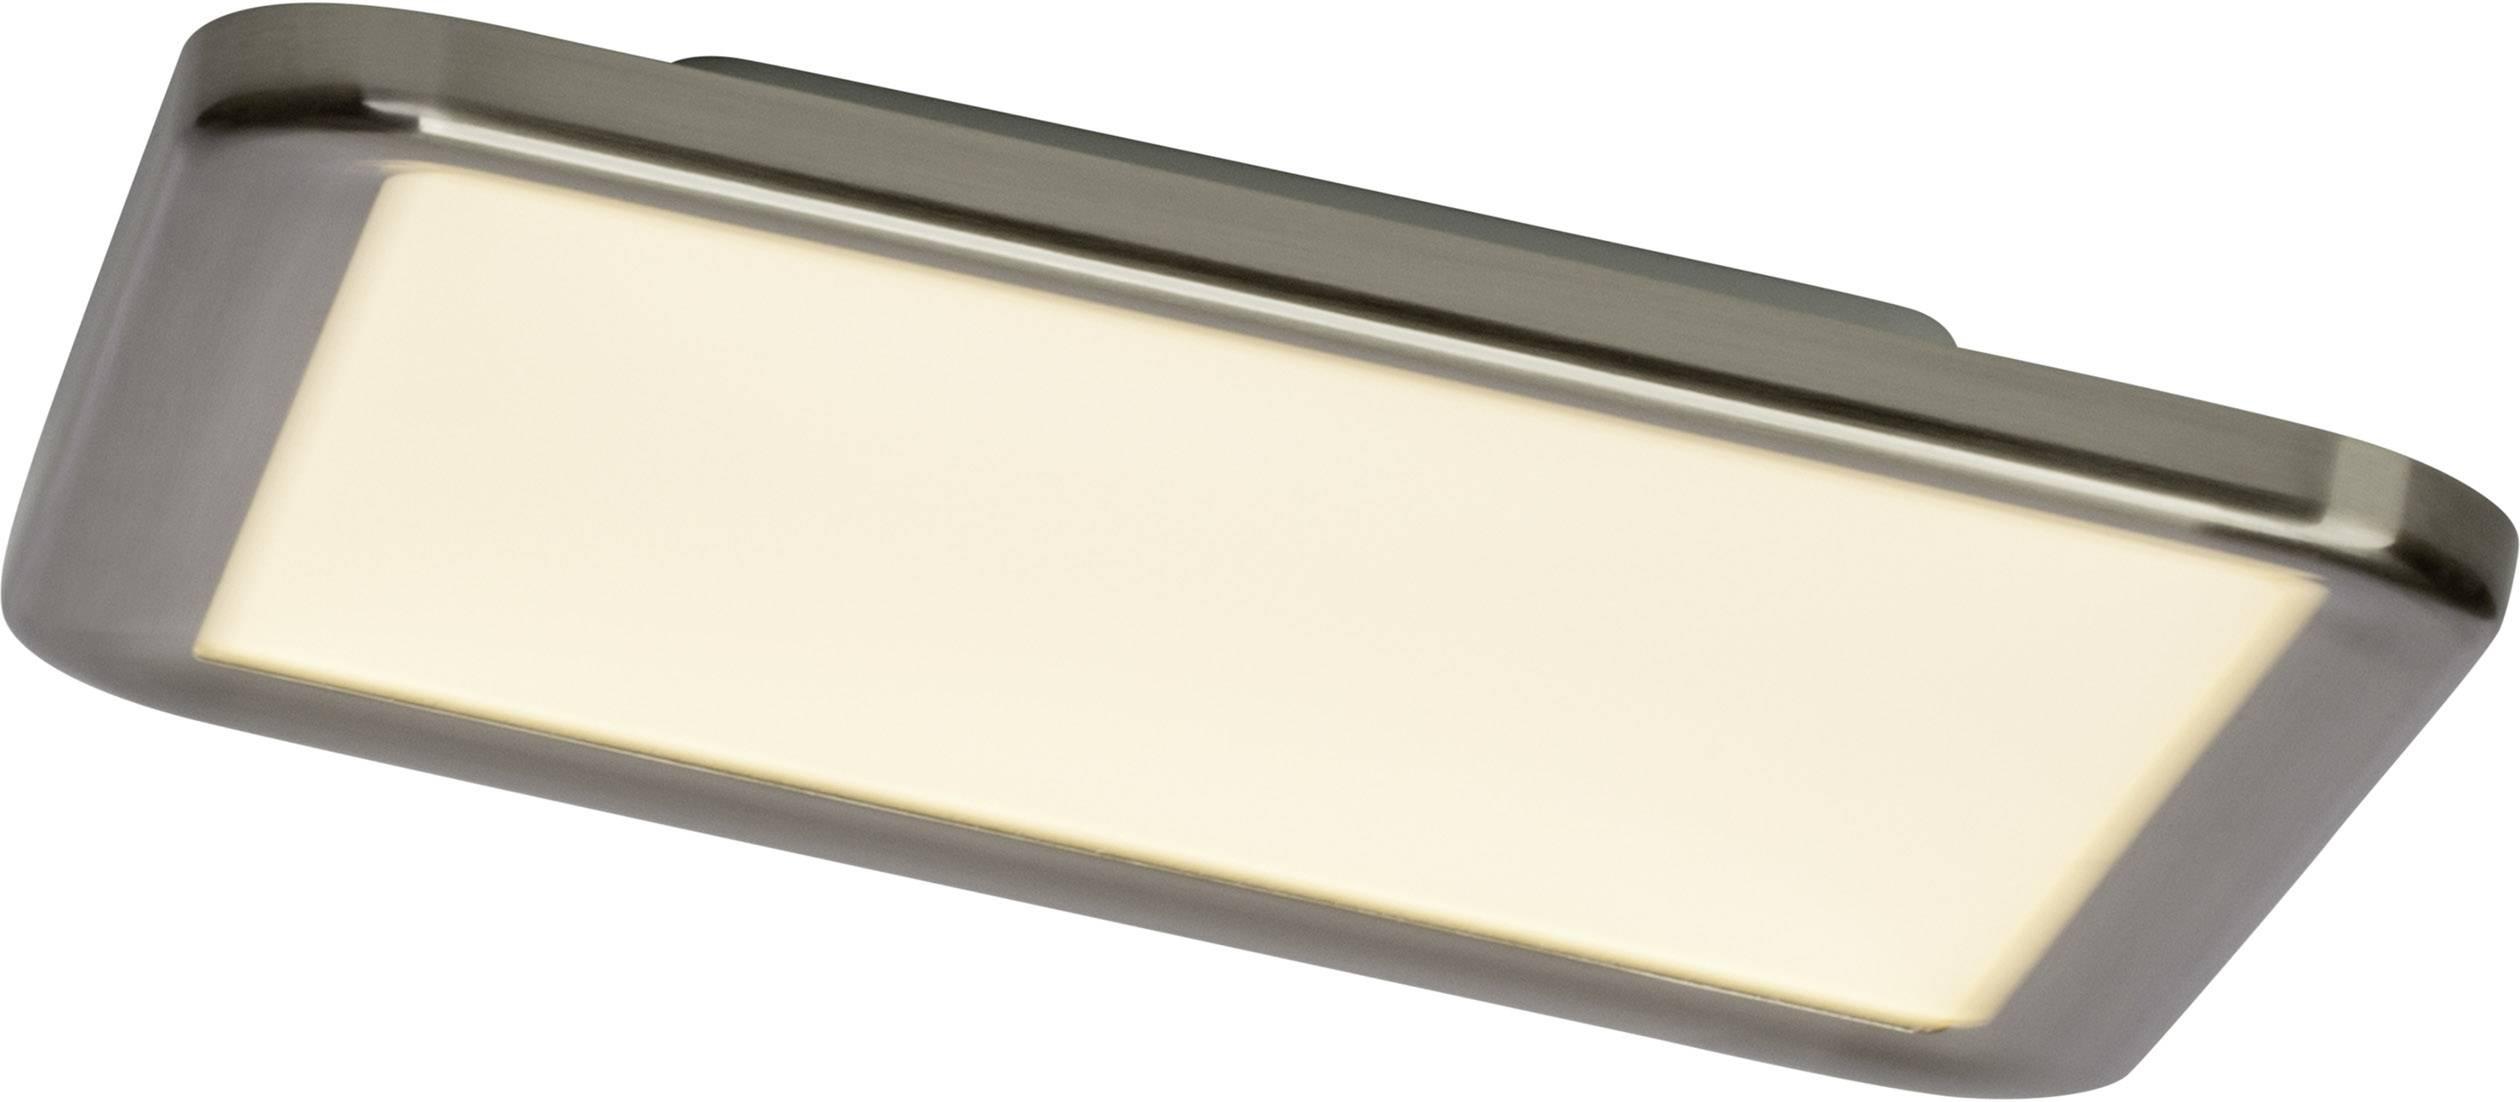 LED-plafondlamp voor badkamer 23 W Warm-wit Brilliant G94486/13 ...